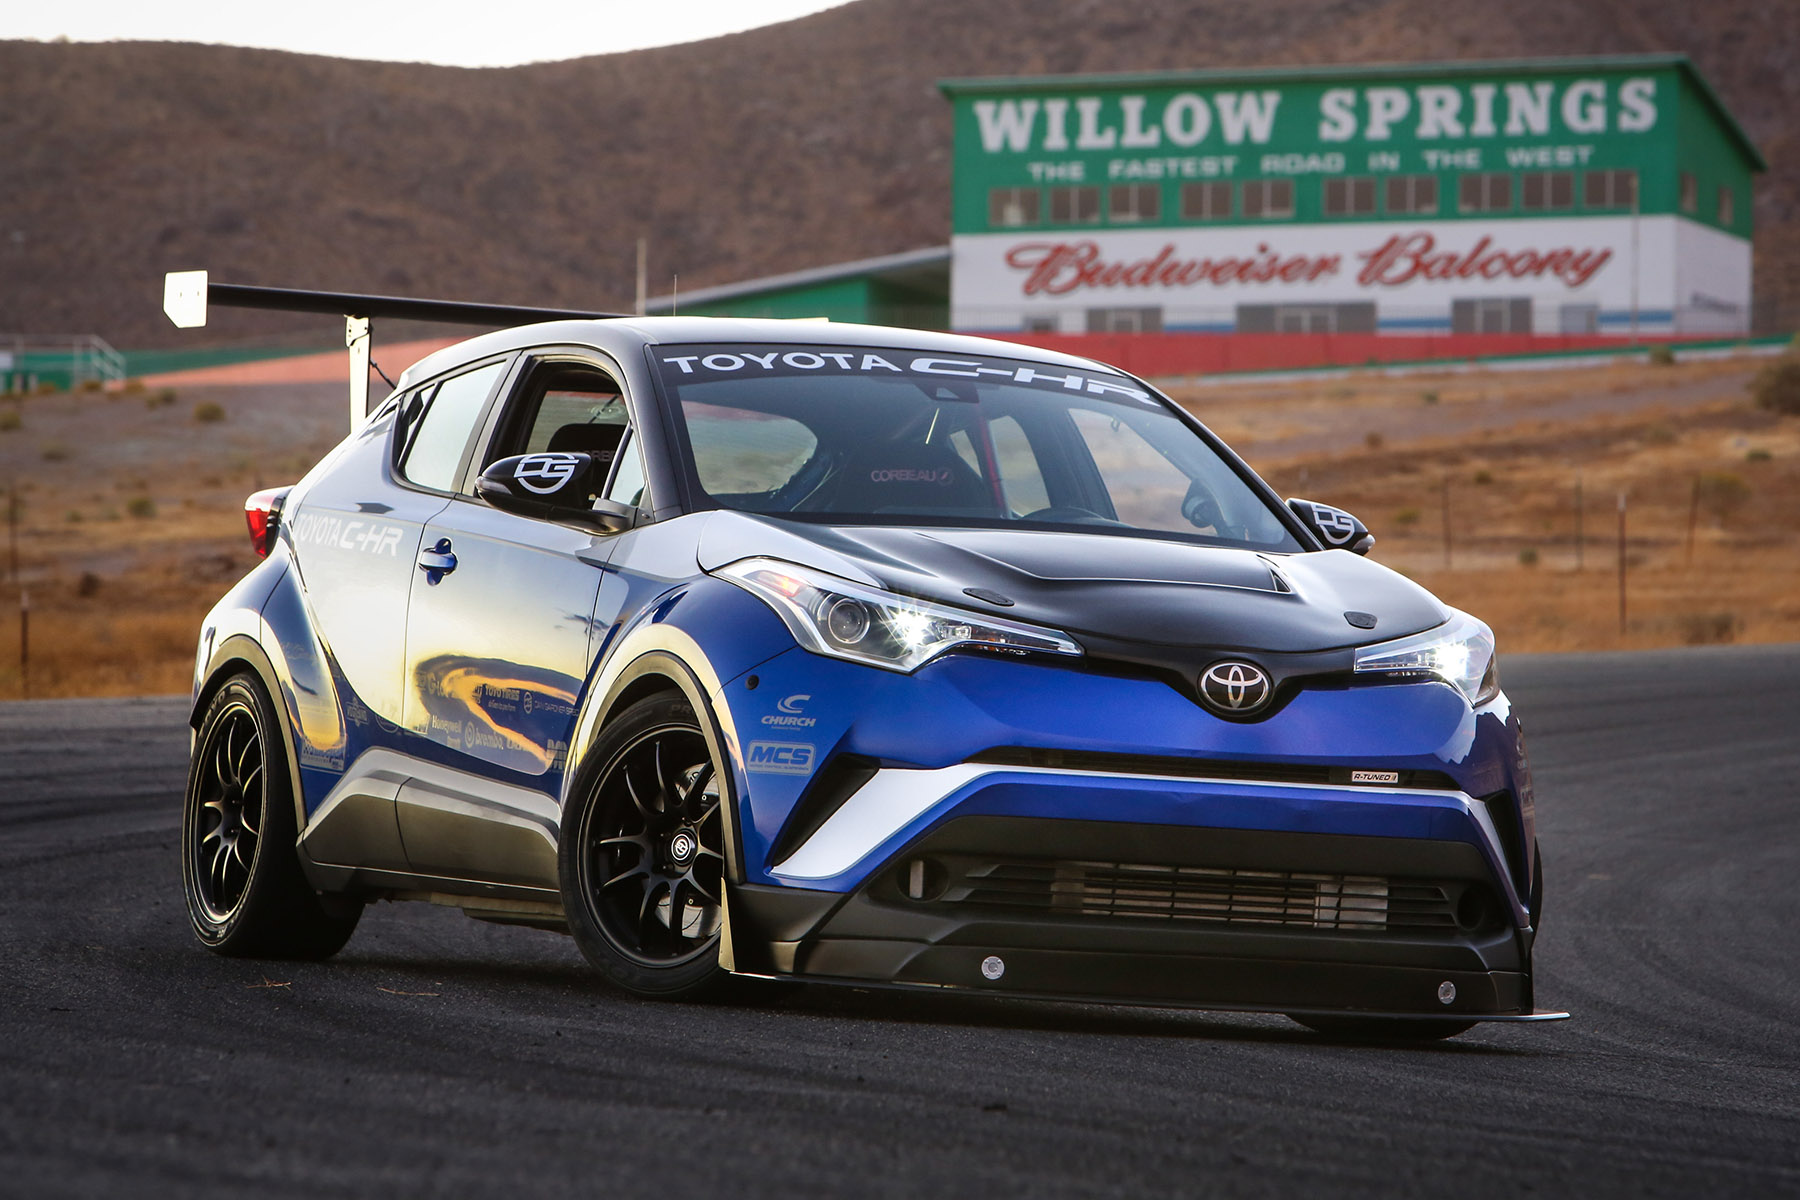 Kekurangan Toyota Turbo Murah Berkualitas